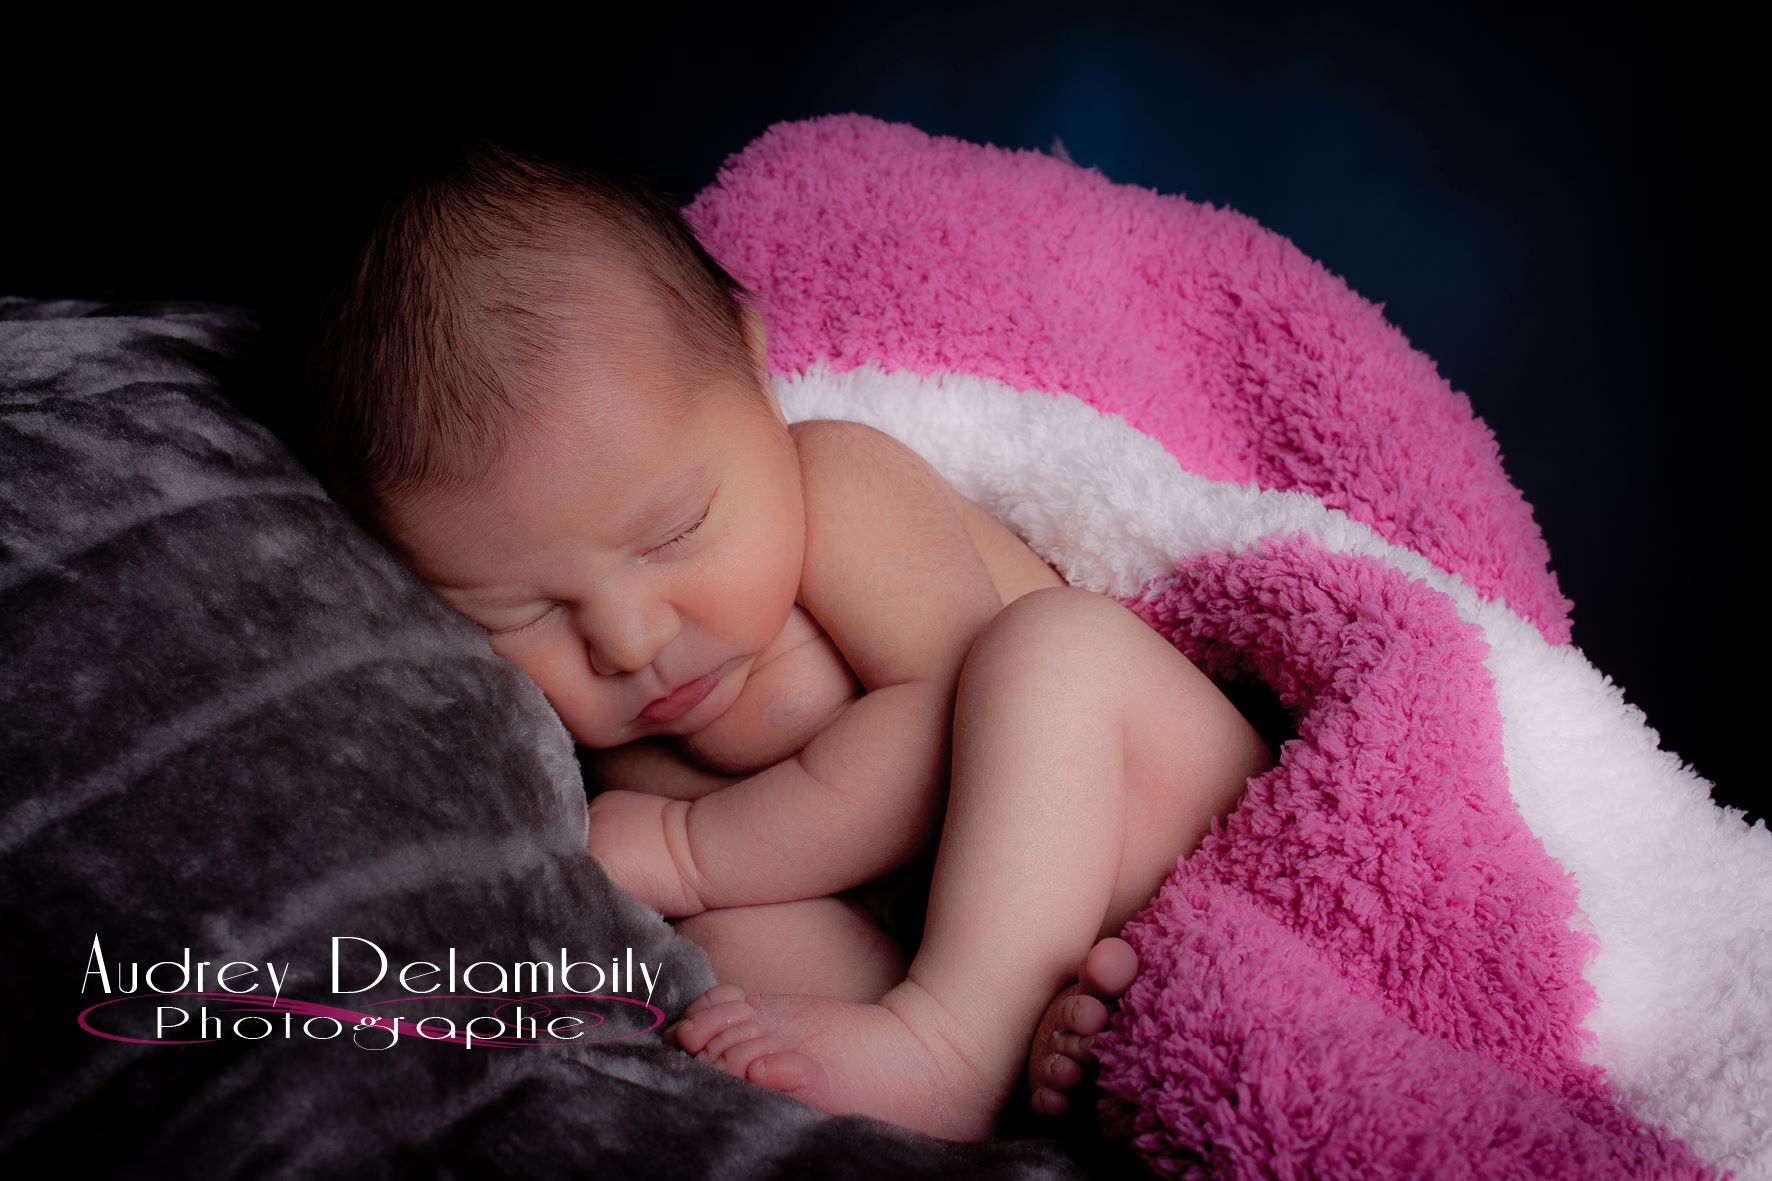 photographe-de-bebe-toulon-003